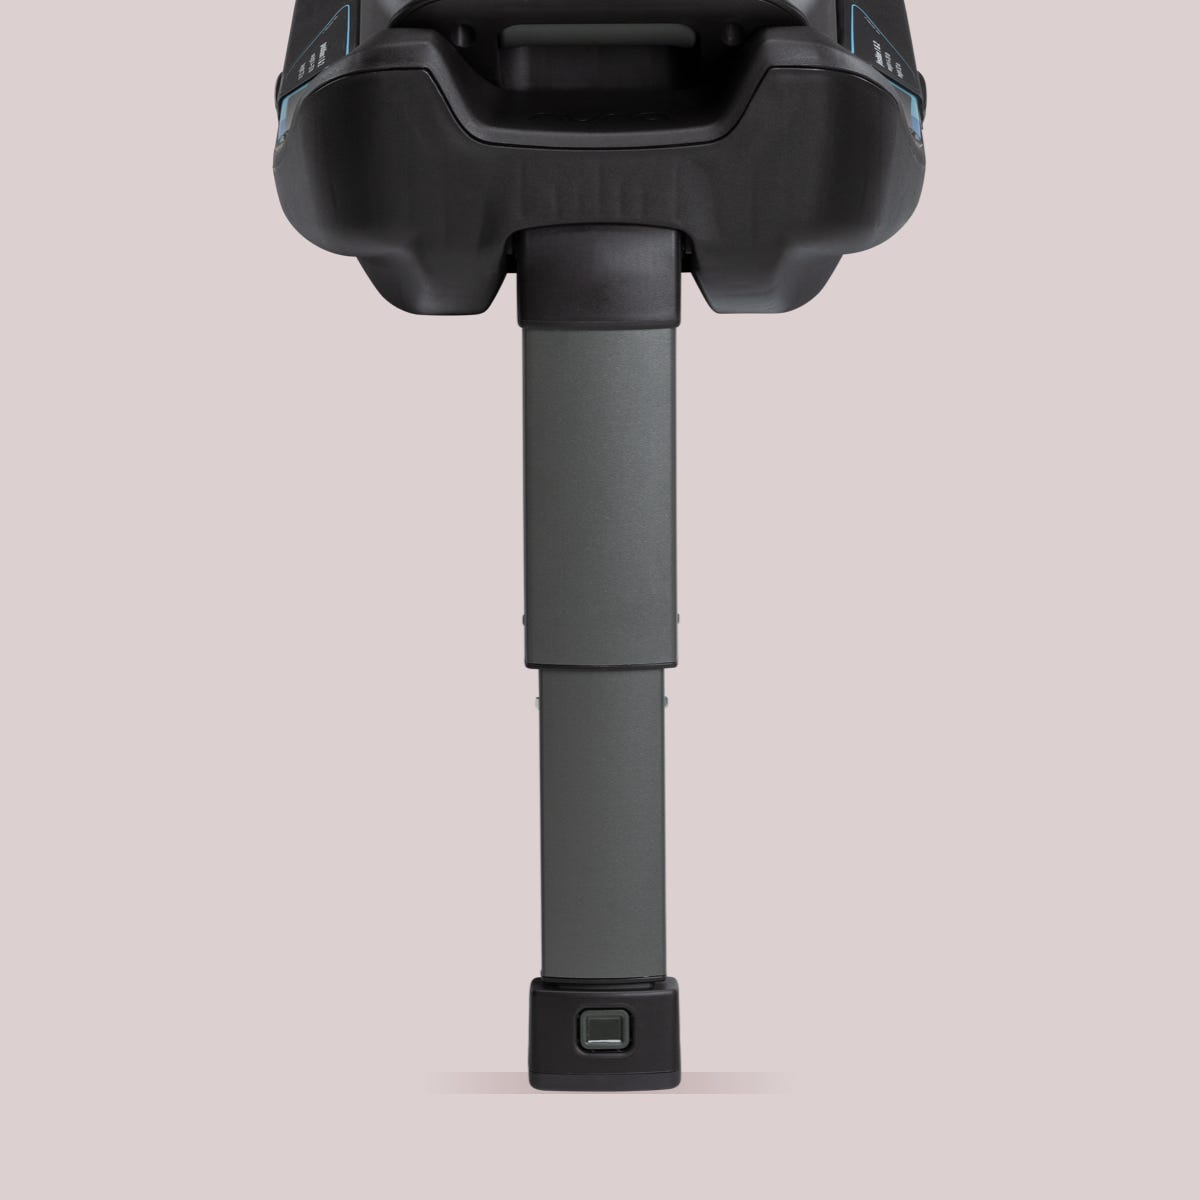 Nuna load leg on RELX™ base